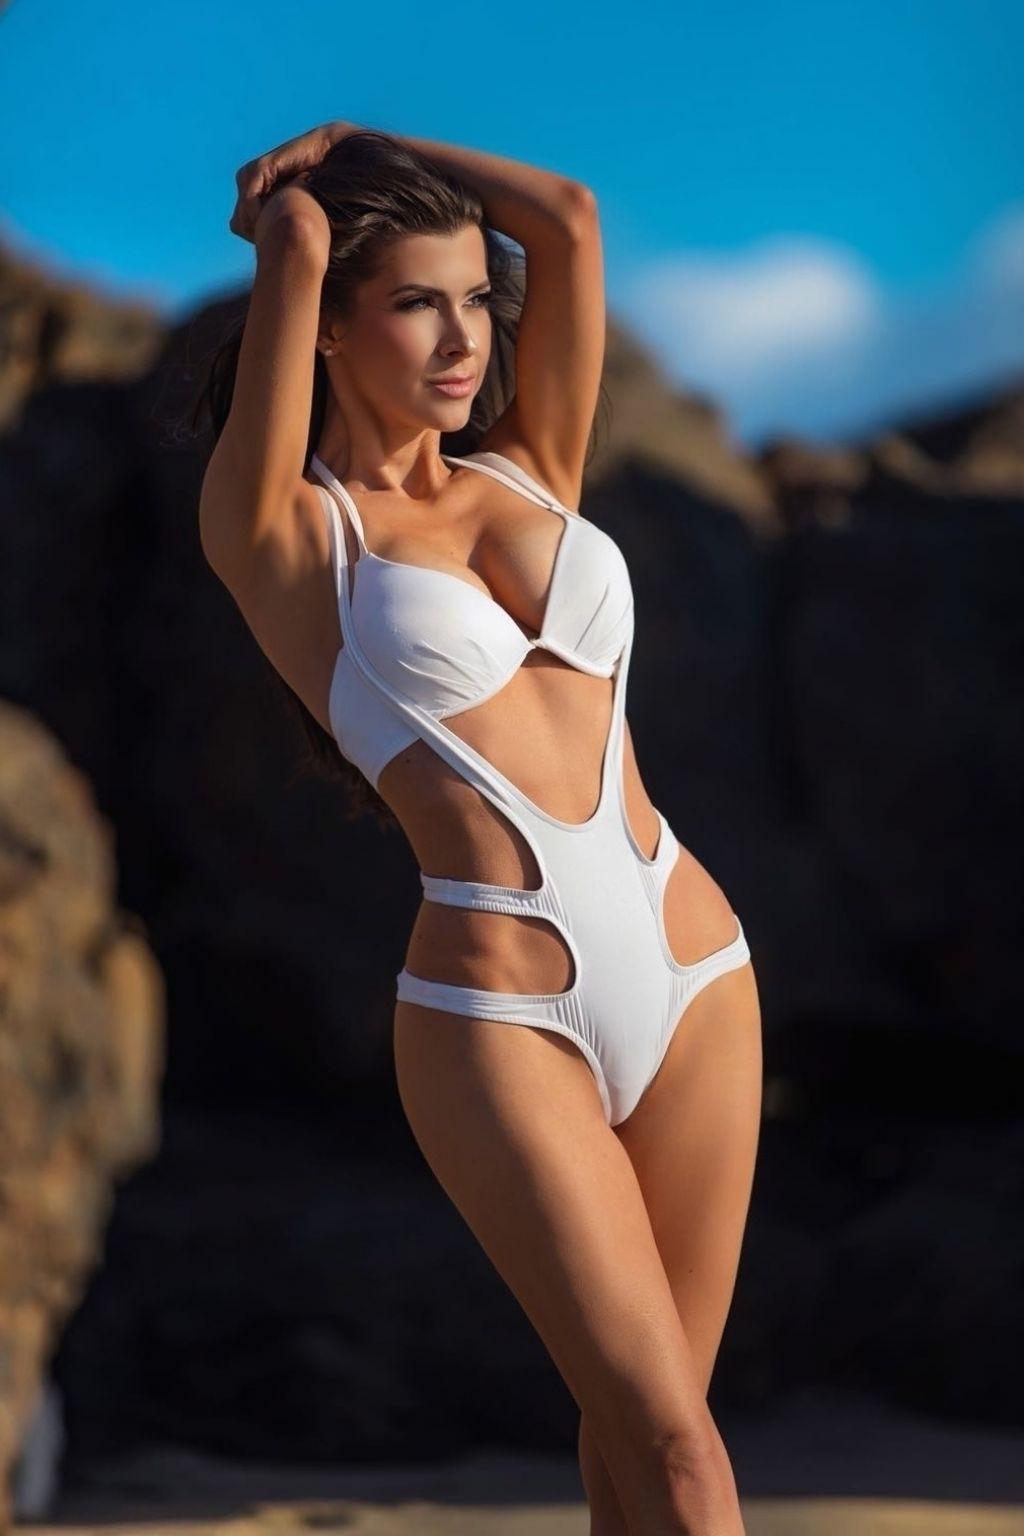 Video Ildiko Ferenczi nude (84 photos), Topless, Paparazzi, Selfie, braless 2015